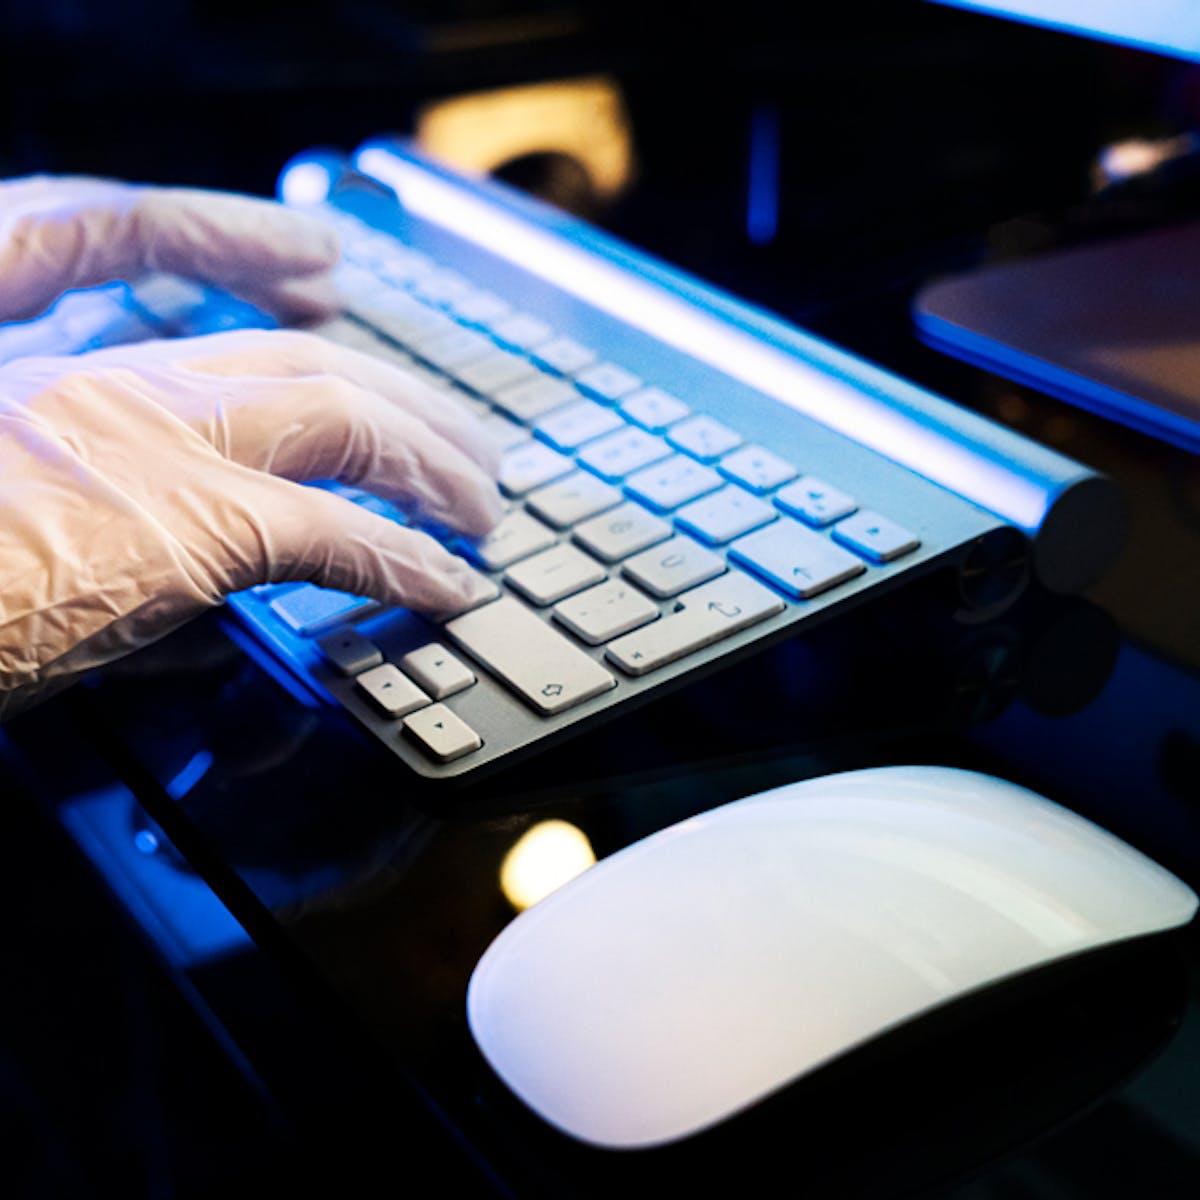 Cybersecurity 2021: Das sind die Trends